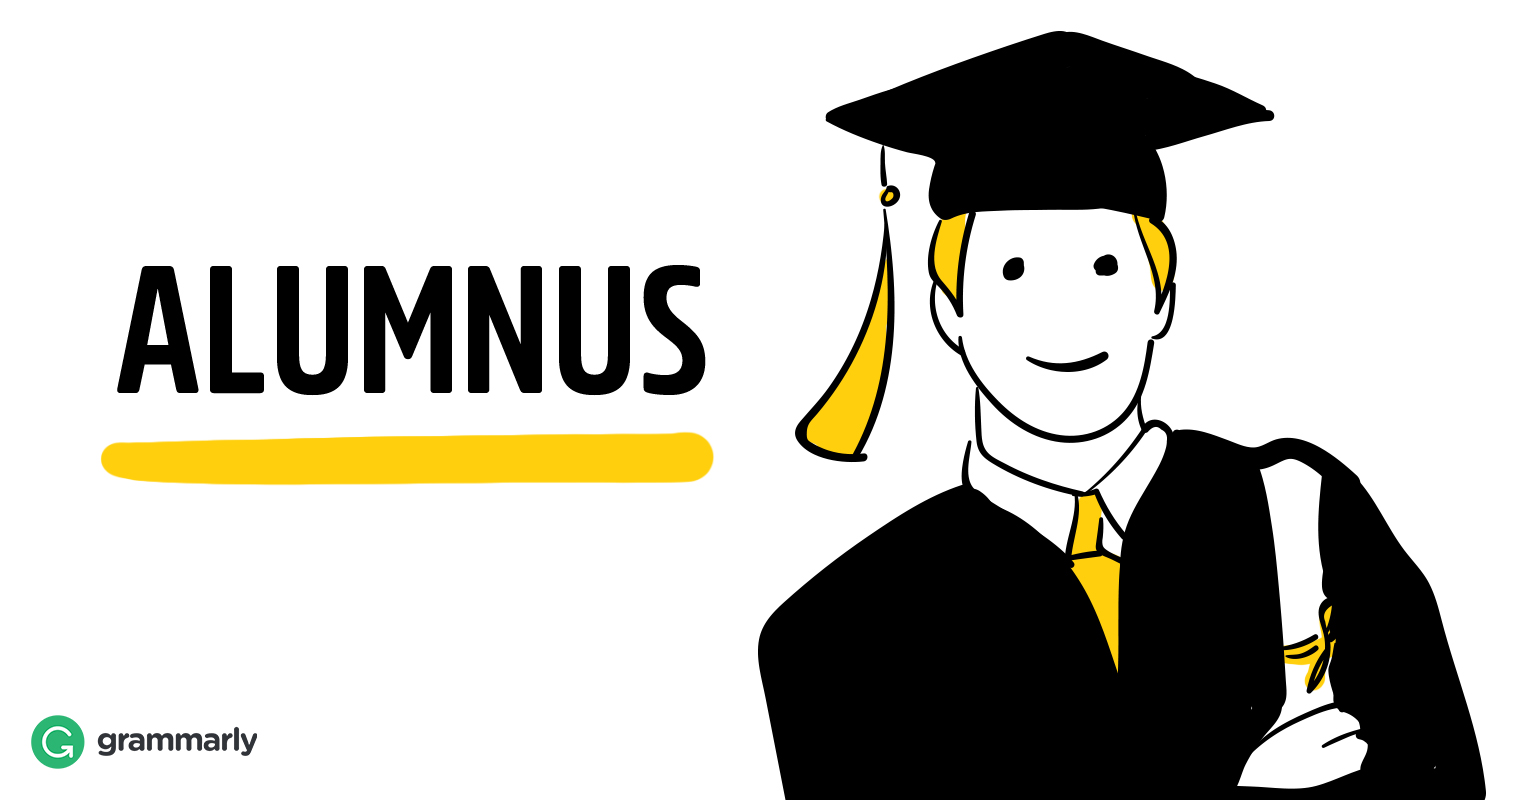 Alumnus visual definition